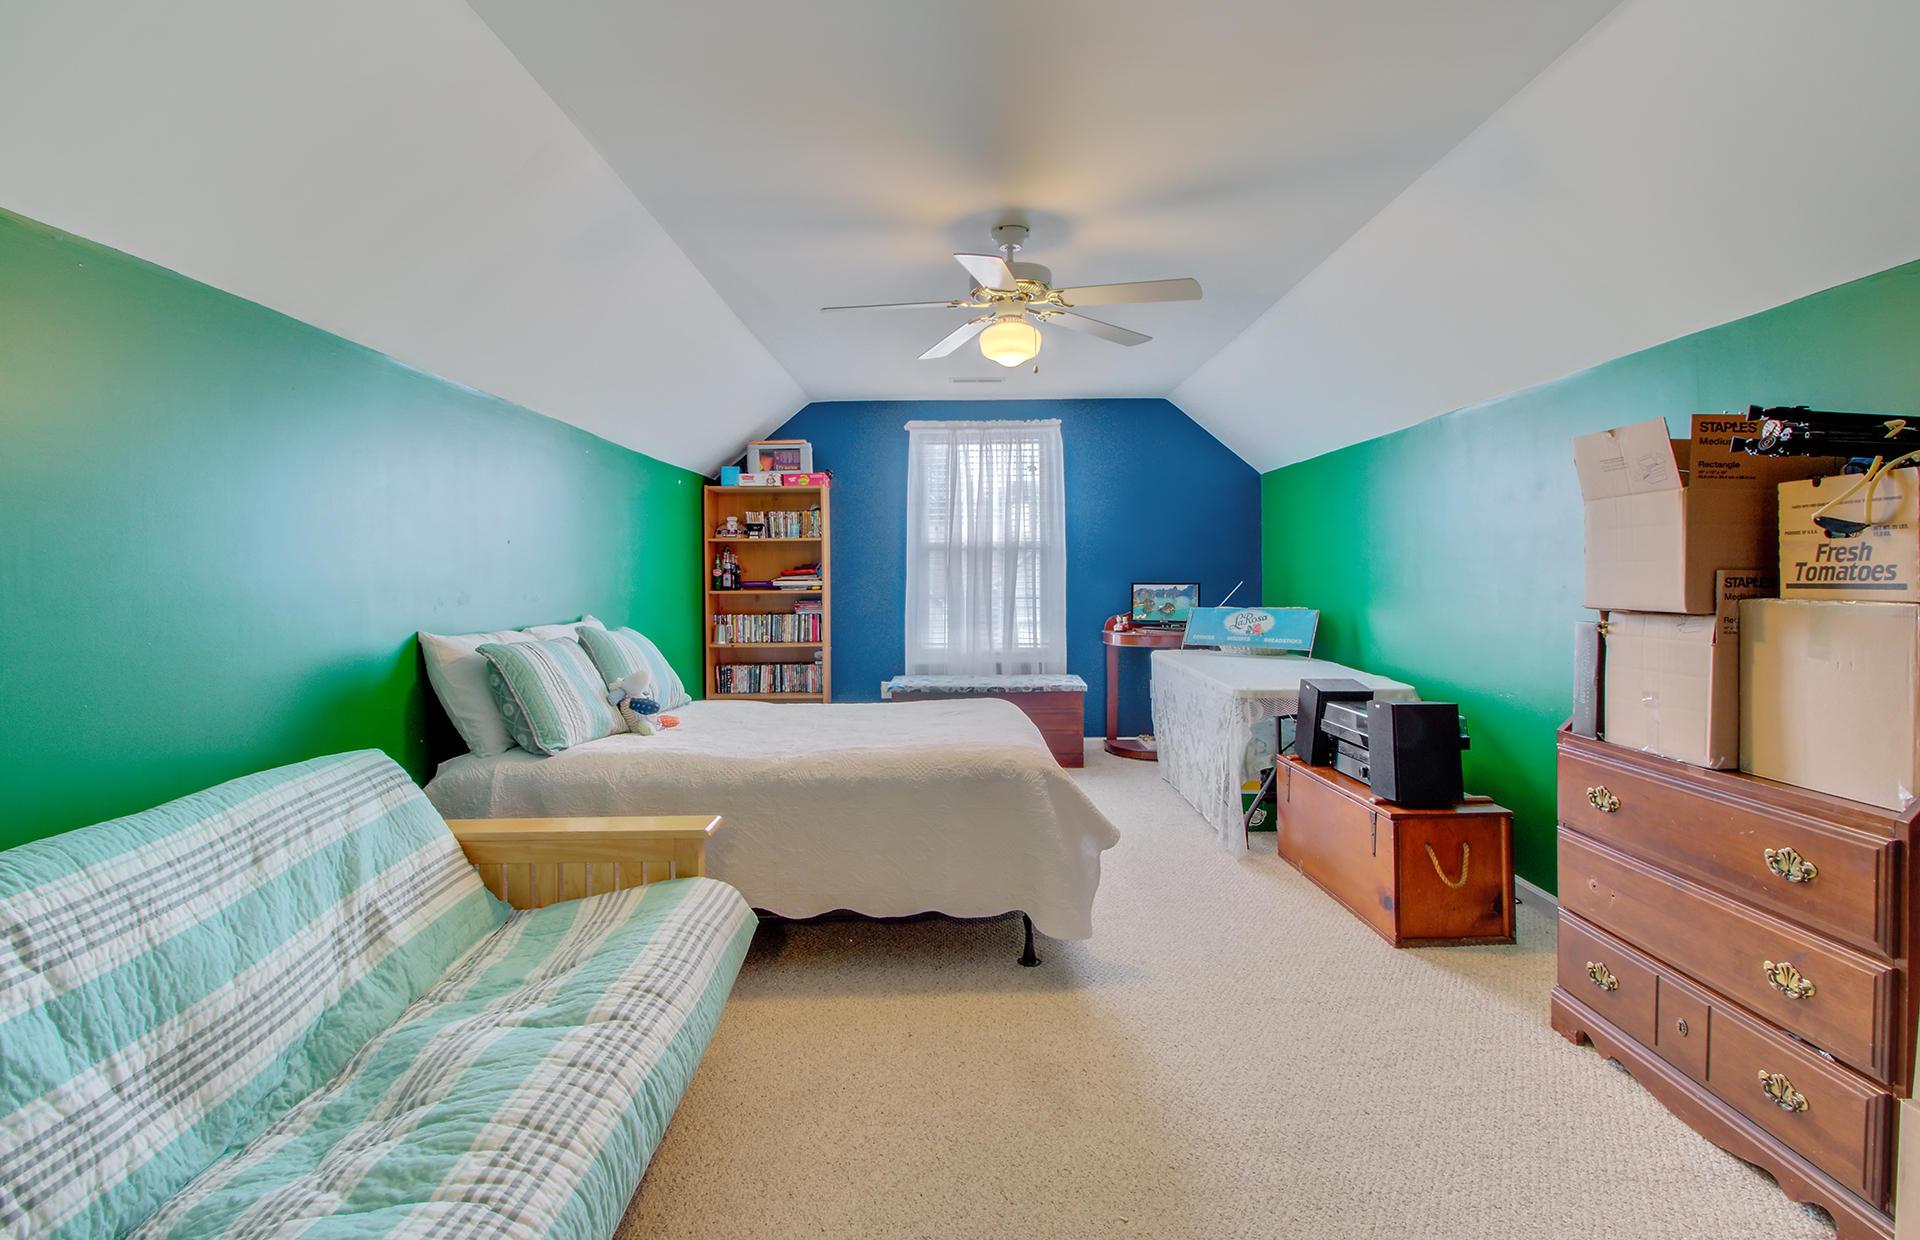 Park West Homes For Sale - 1500 Wellesley, Mount Pleasant, SC - 1